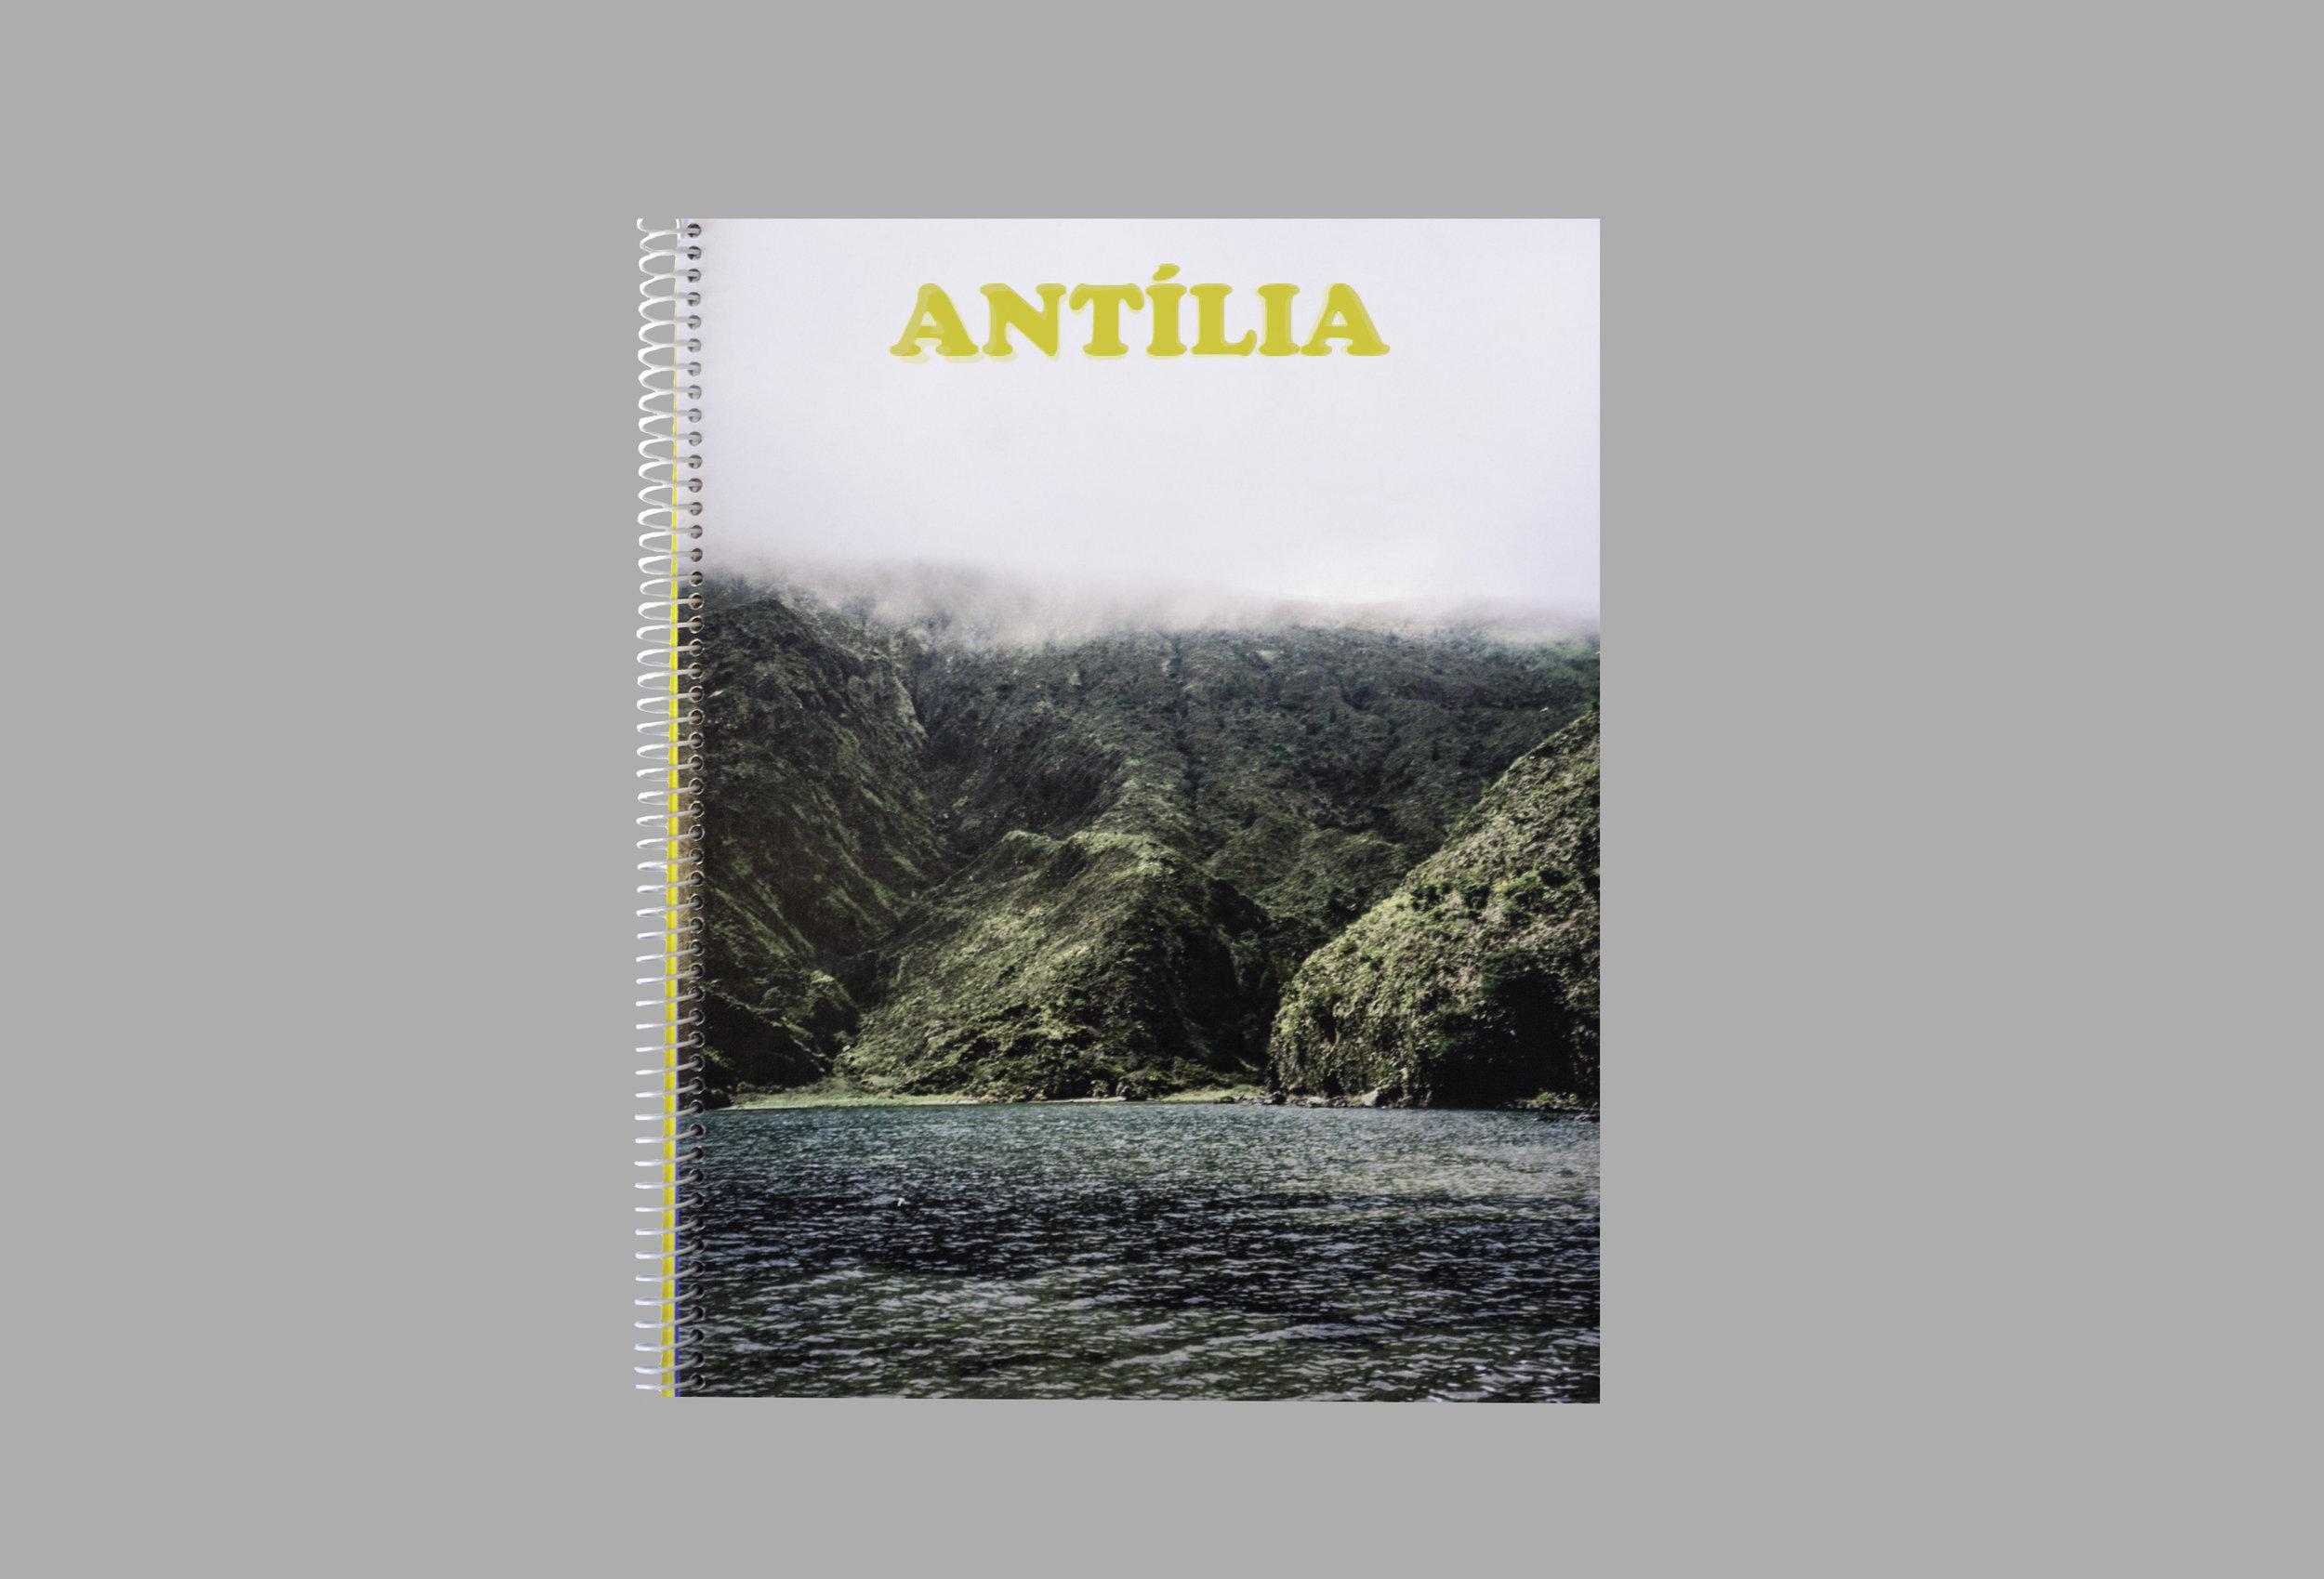 CP_ANTILIA_SPRIAL BOUND_PAGES_003.jpg